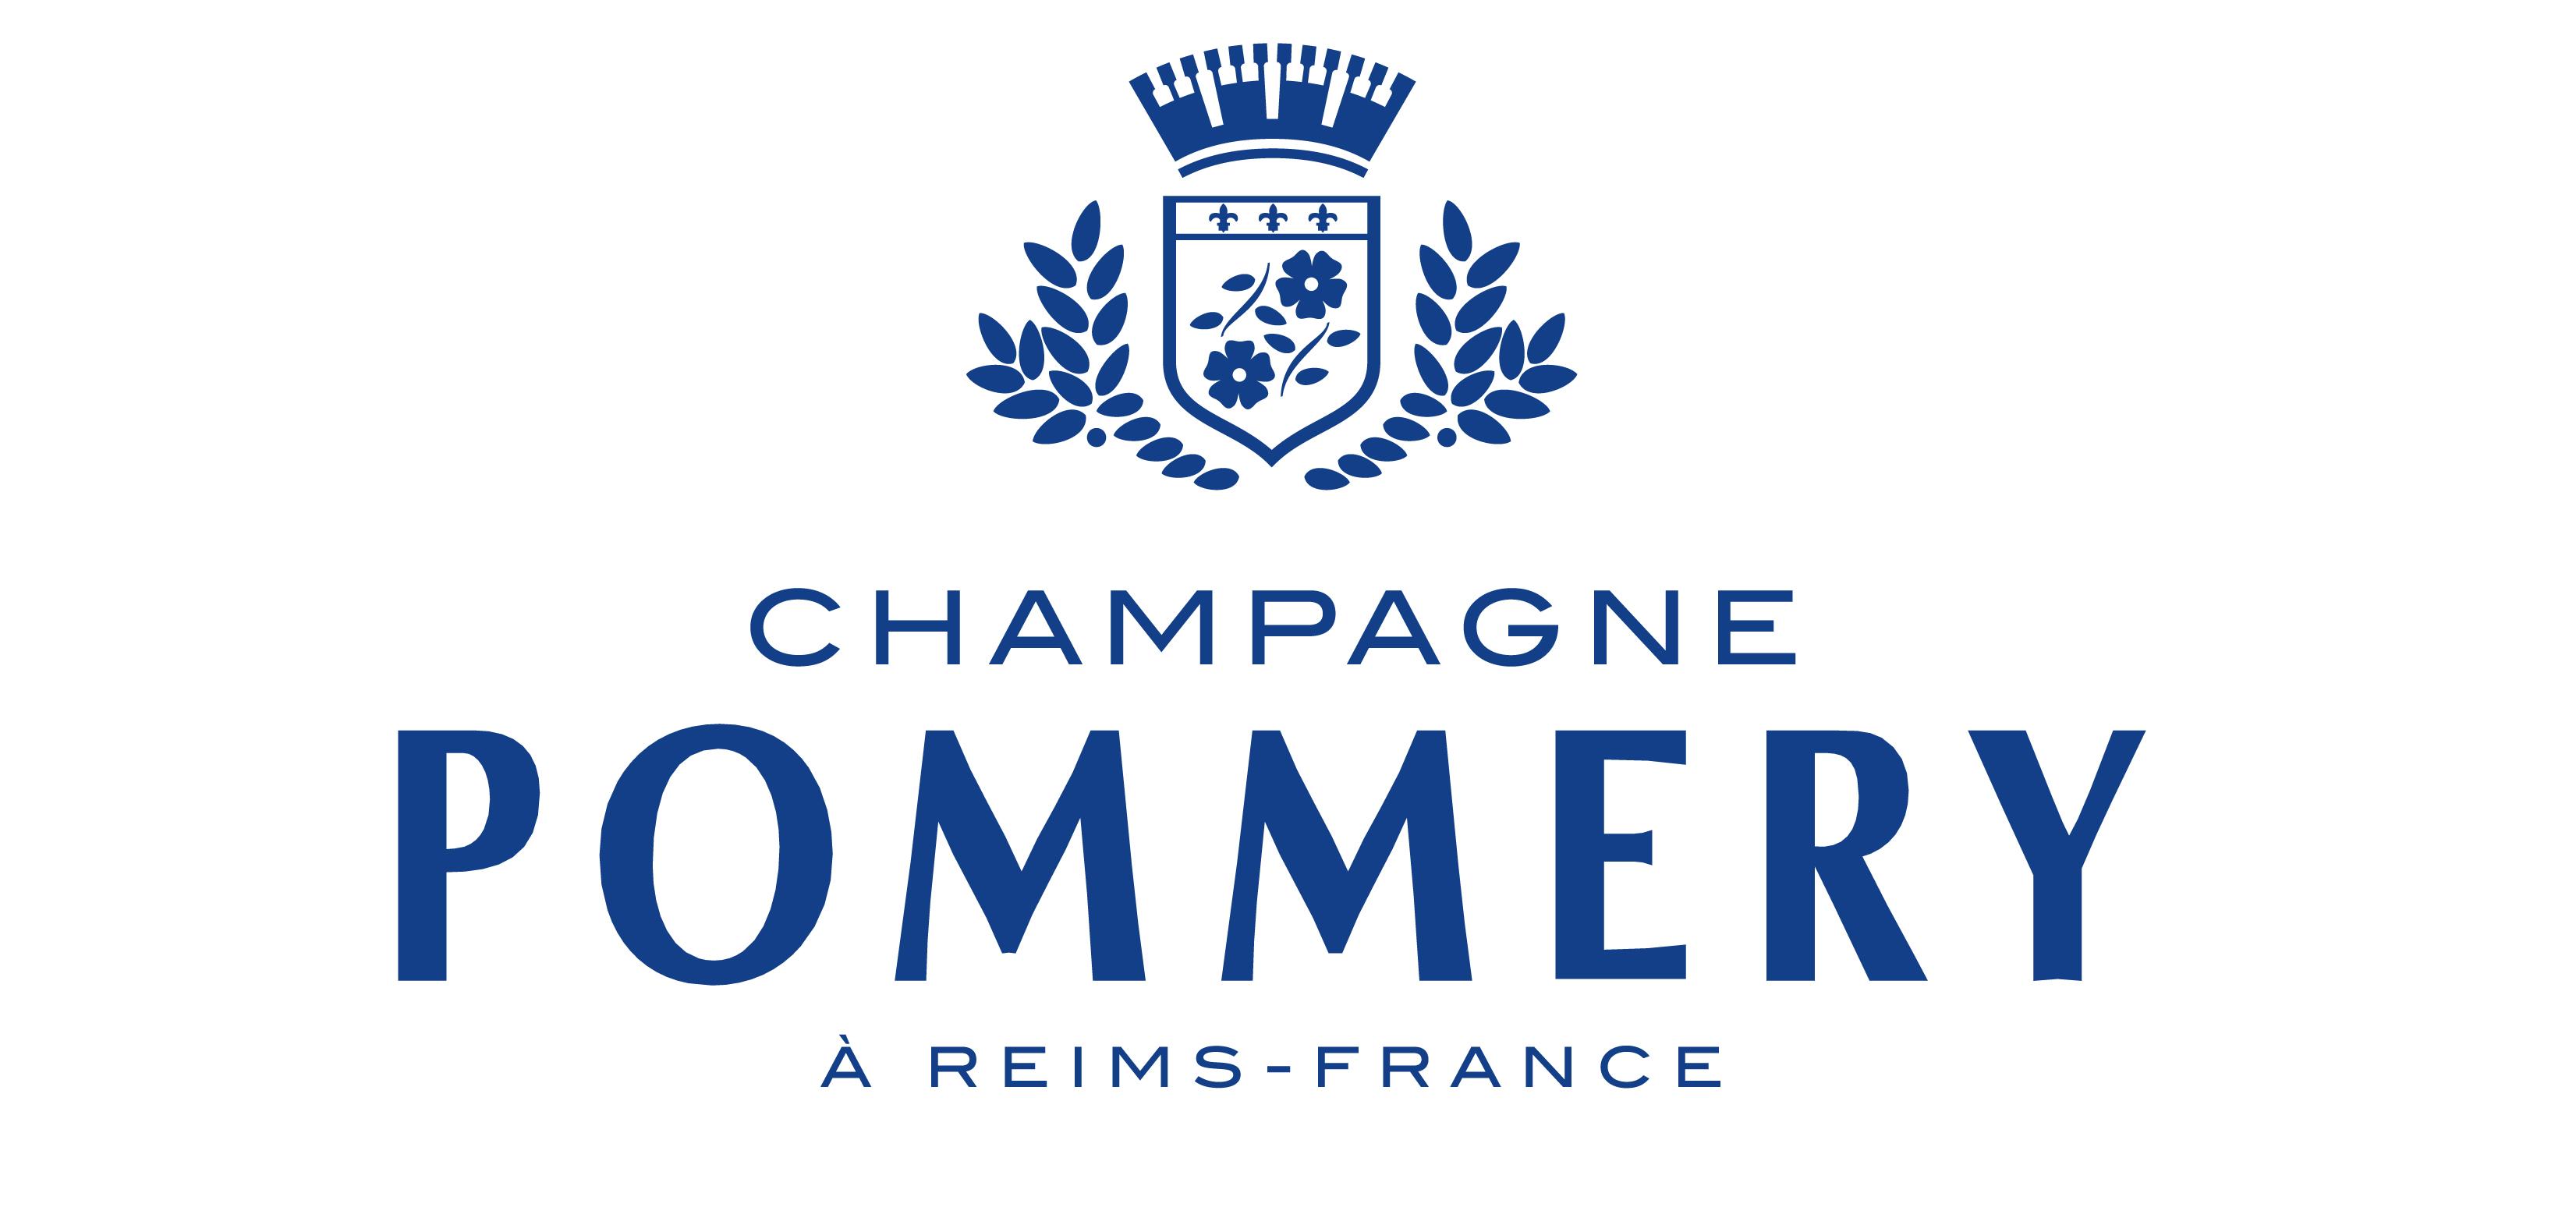 POMMERY-LOGO-sans cartouche-2016-HD